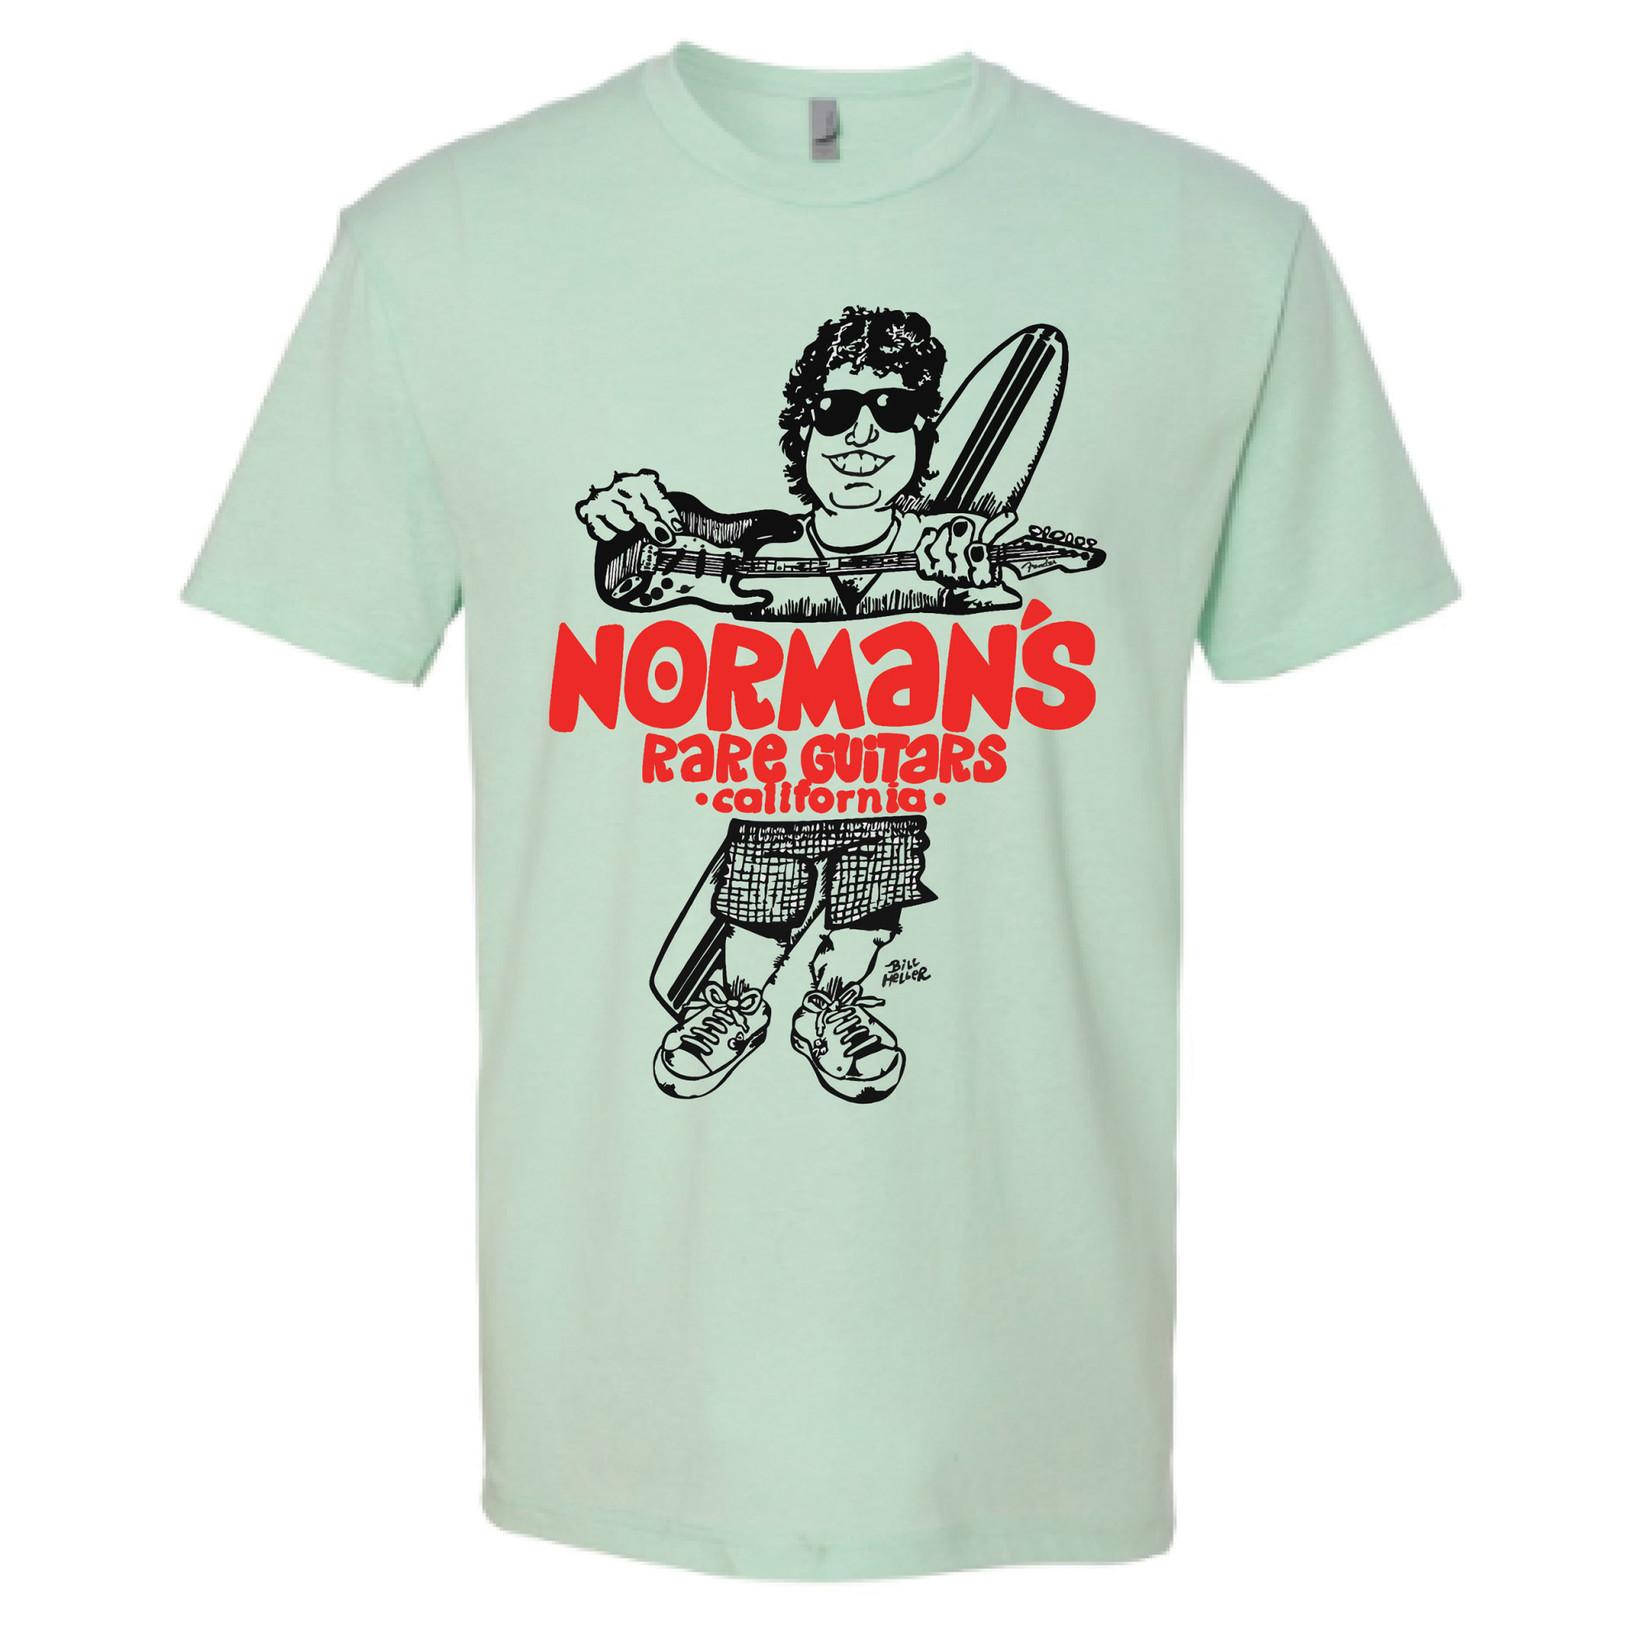 Norman's Rare Guitars Vintage 80's Surfer Norm in Sea Foam Green